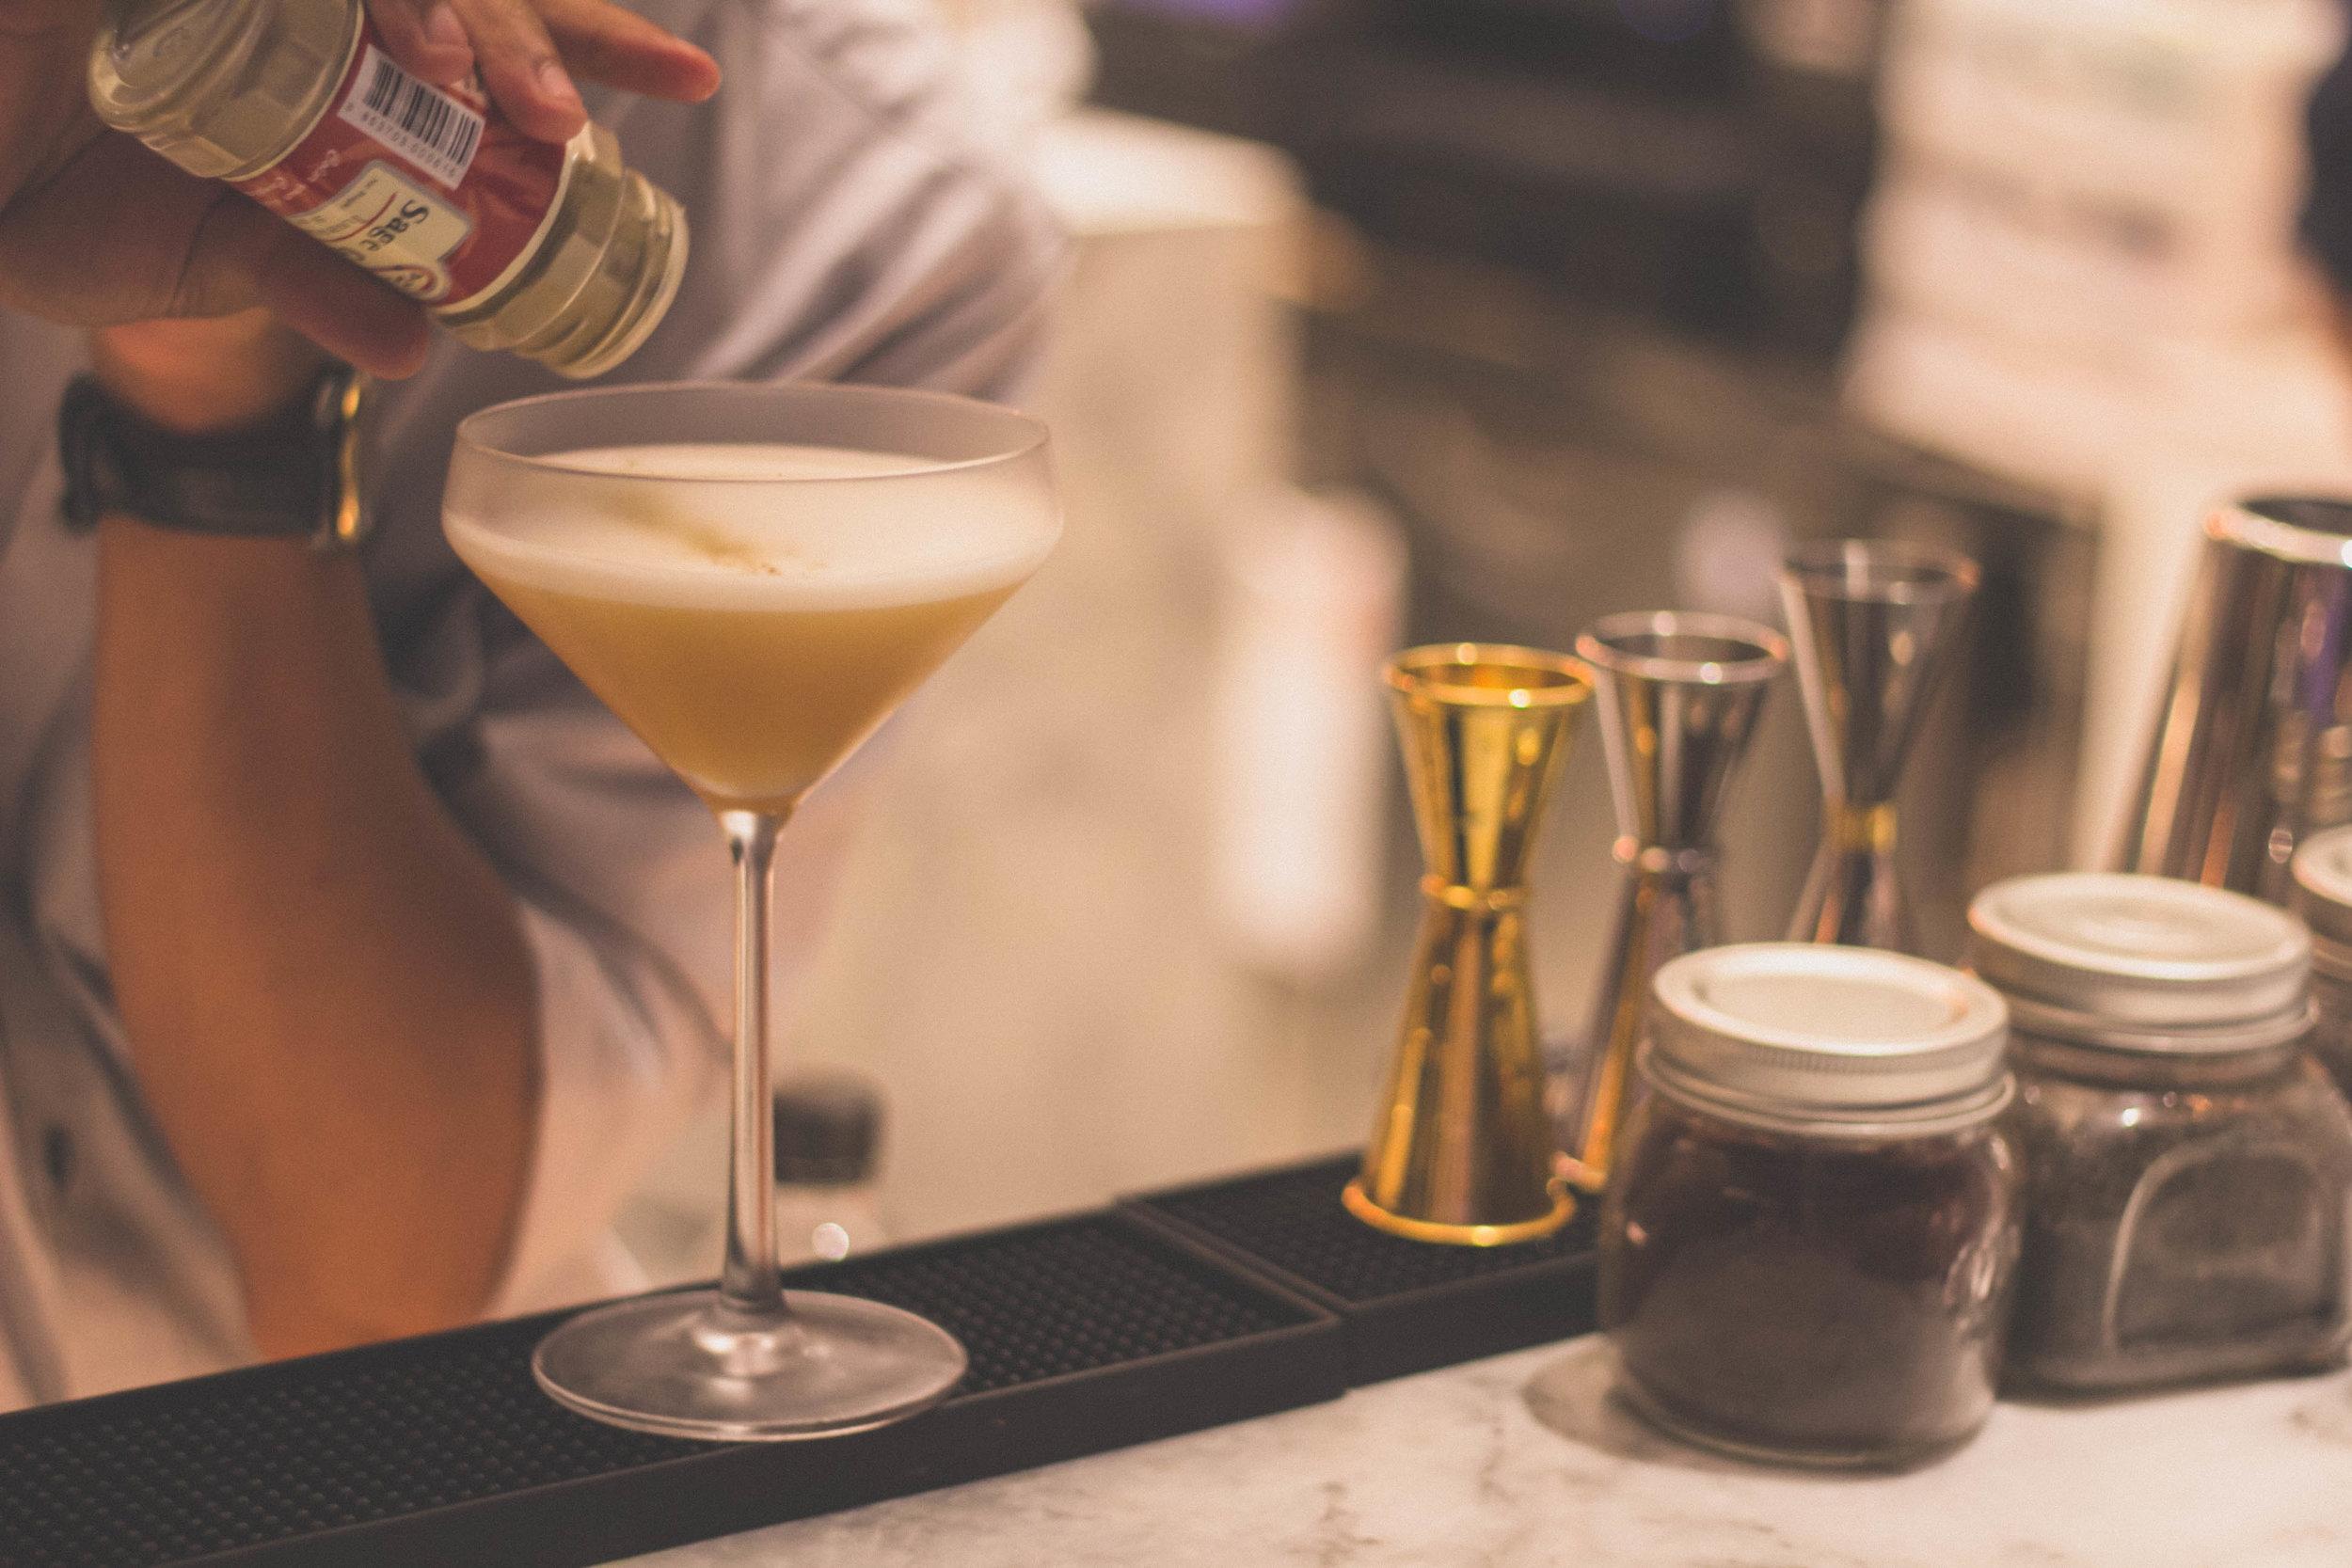 Rent a Bar and Bartender